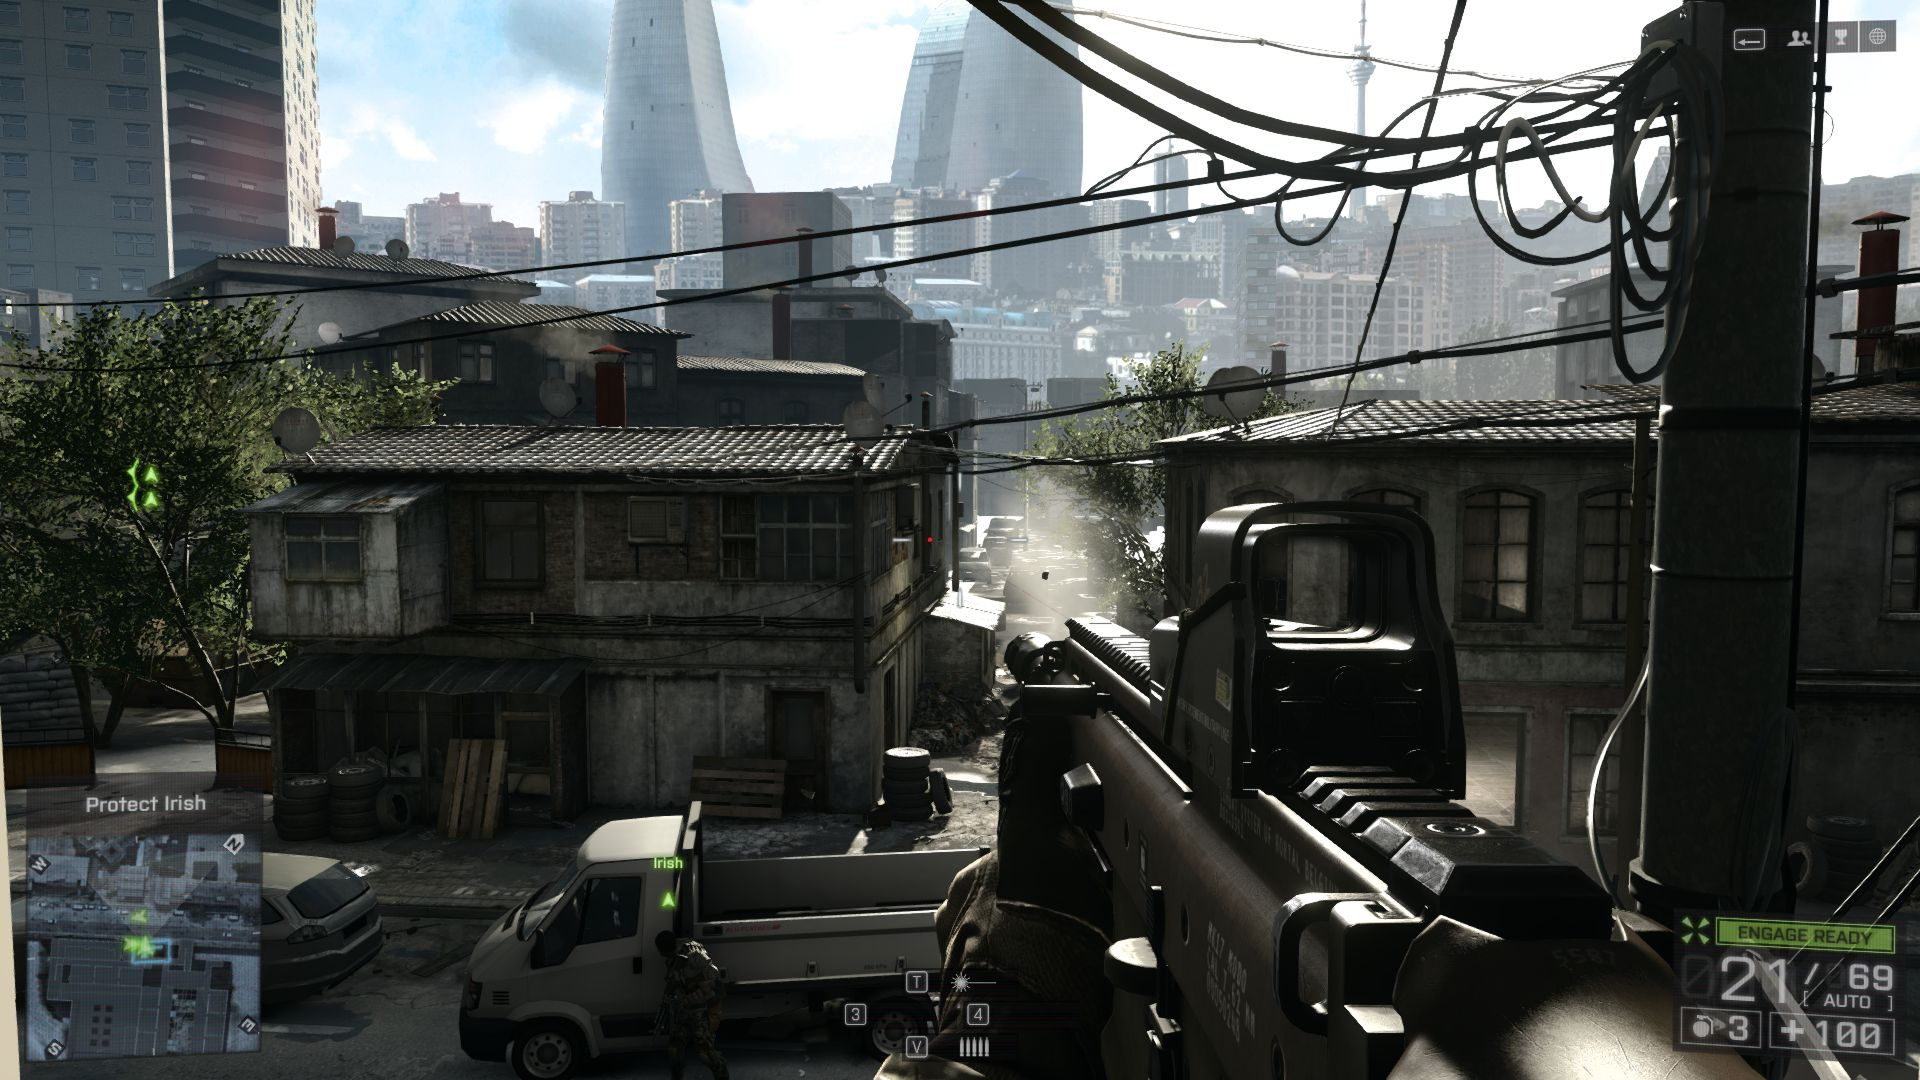 Benchmarkcheck: Battlefield 4 - Notebookcheck.com Tests